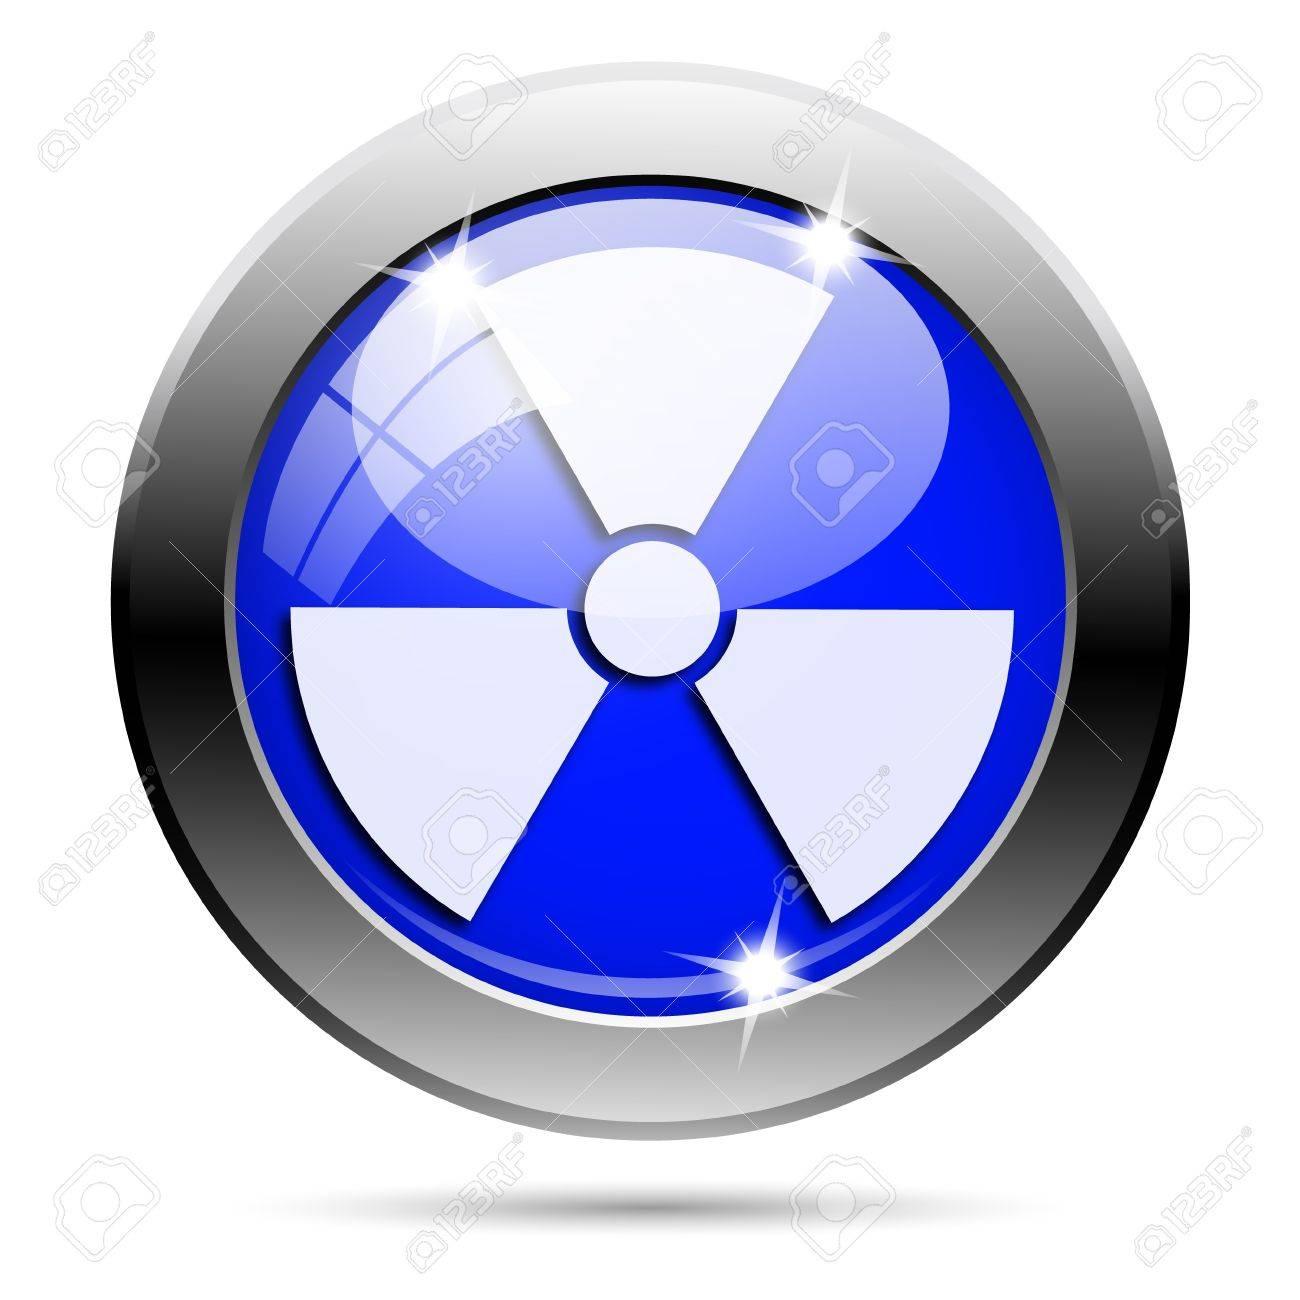 Metallic round glossy icon with white design on blue background Stock Photo - 21986551